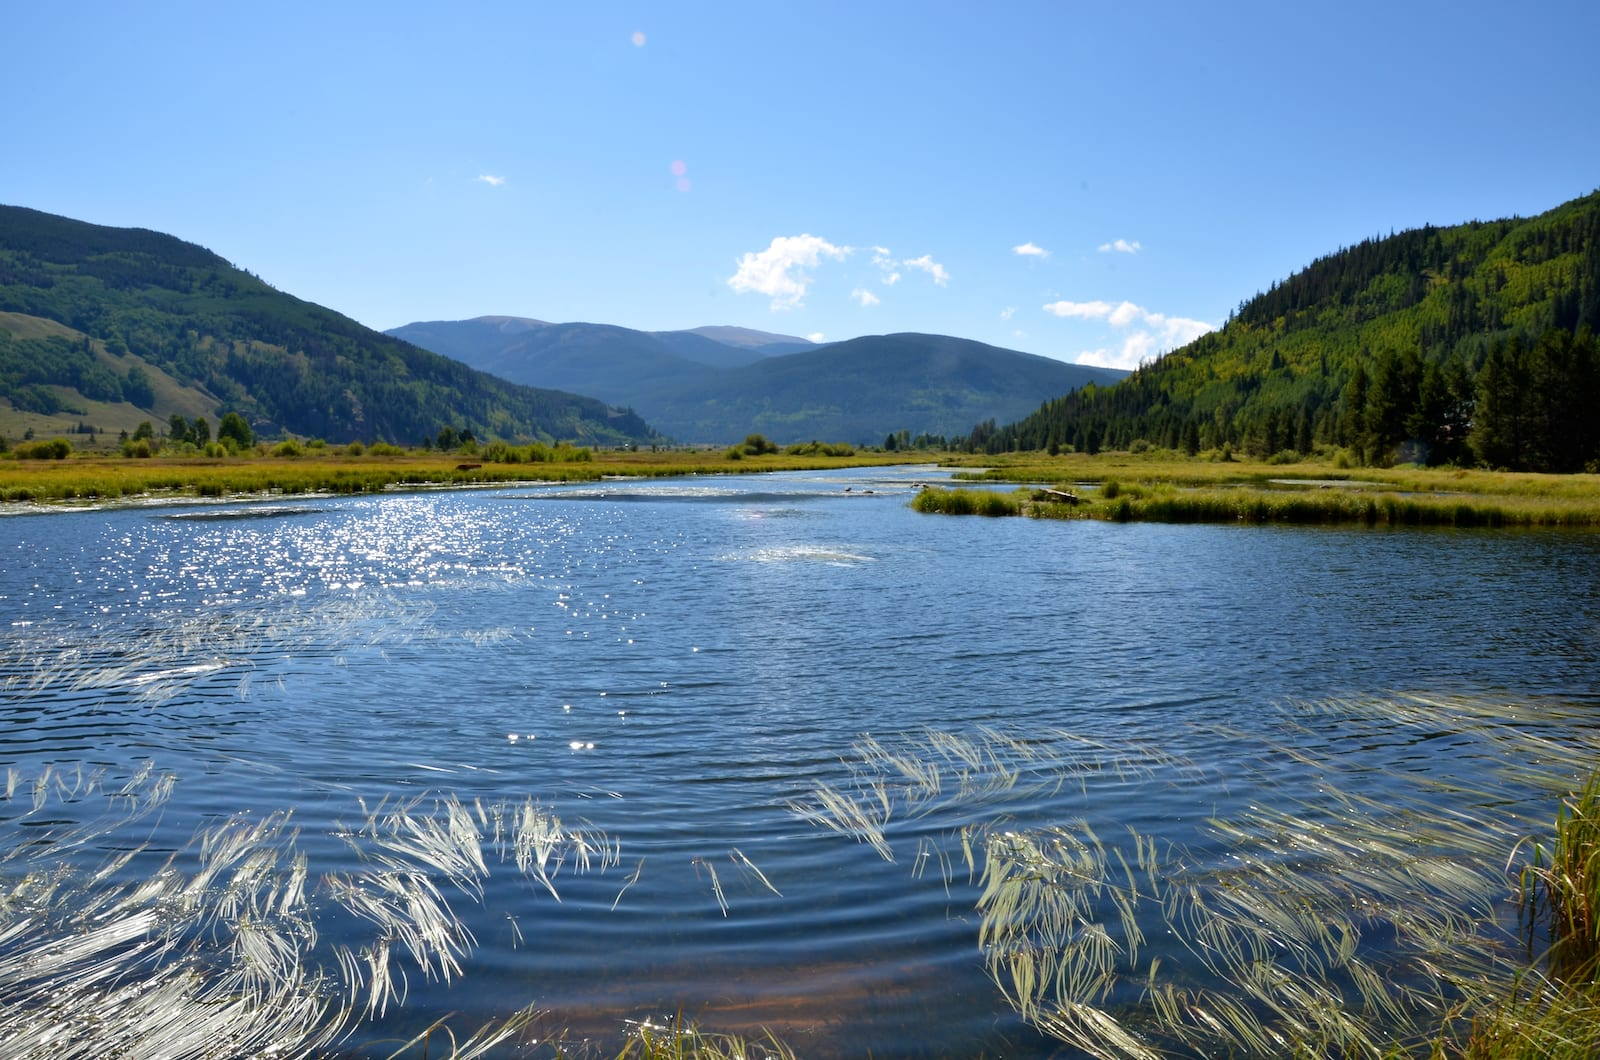 Camp Hale Colorado Lake